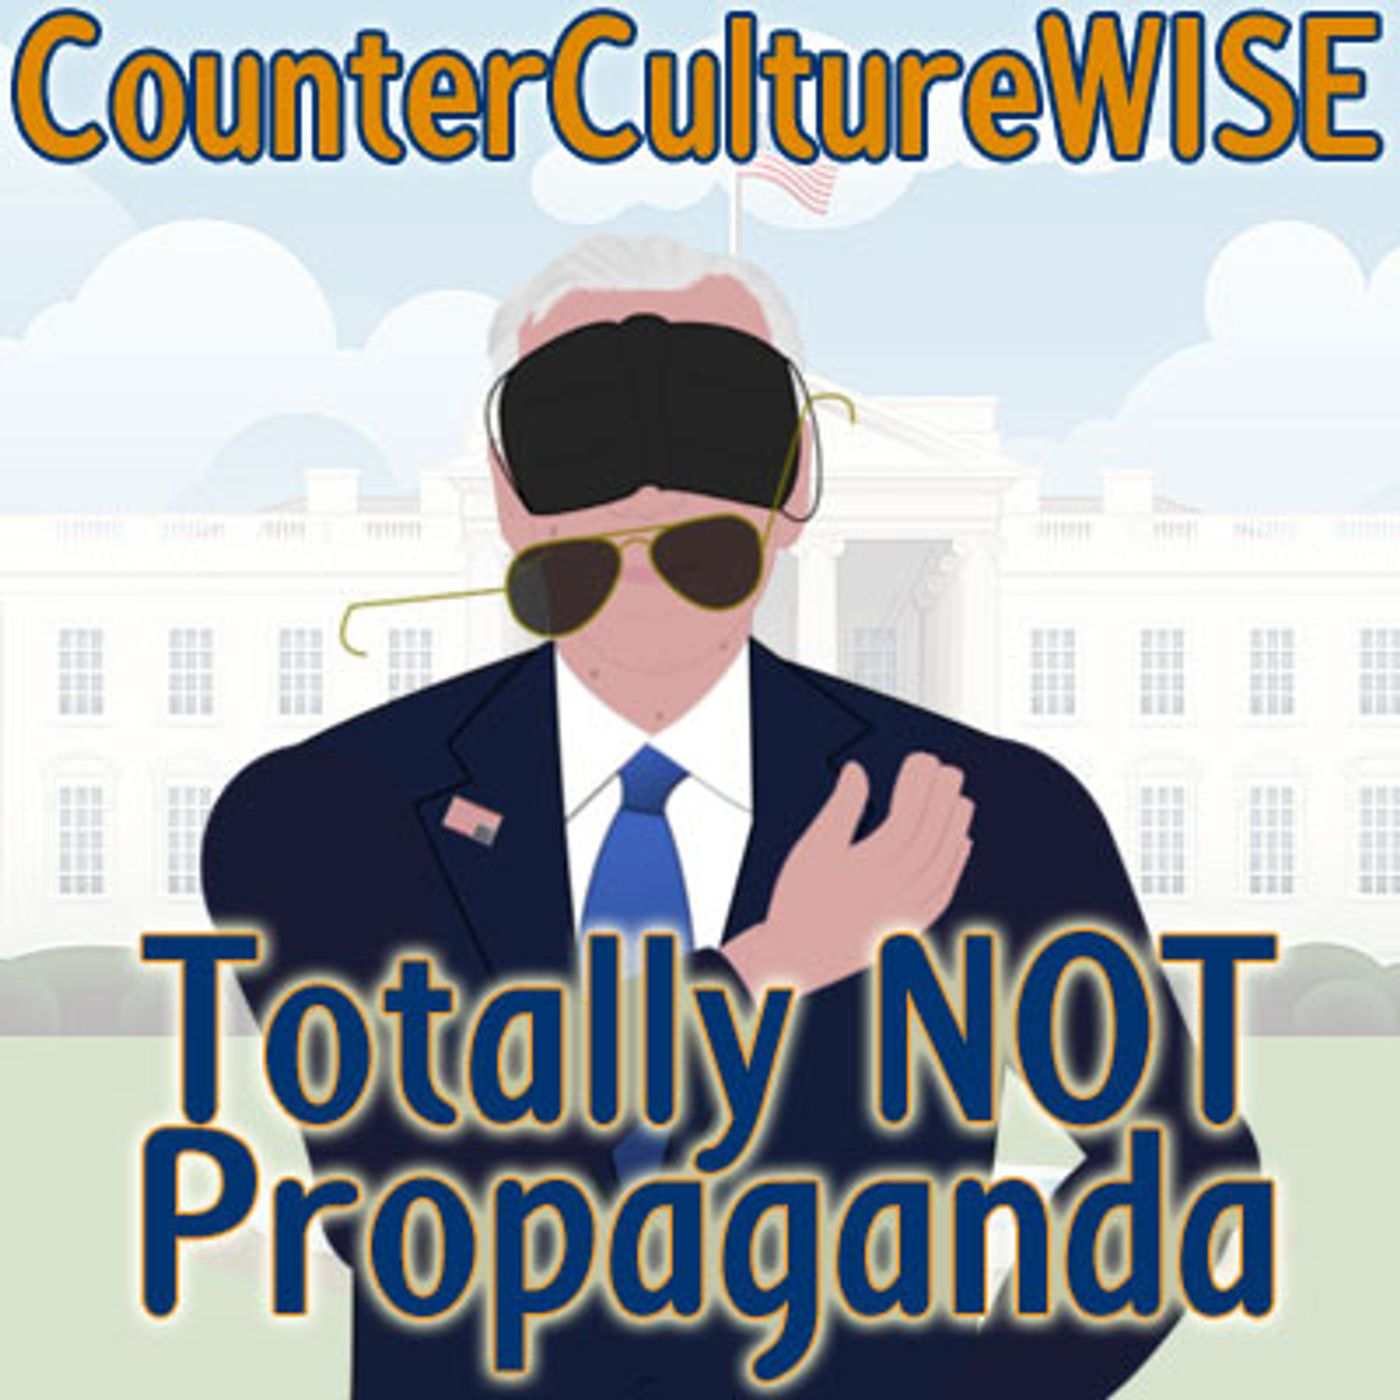 Totally NOT Propaganda!